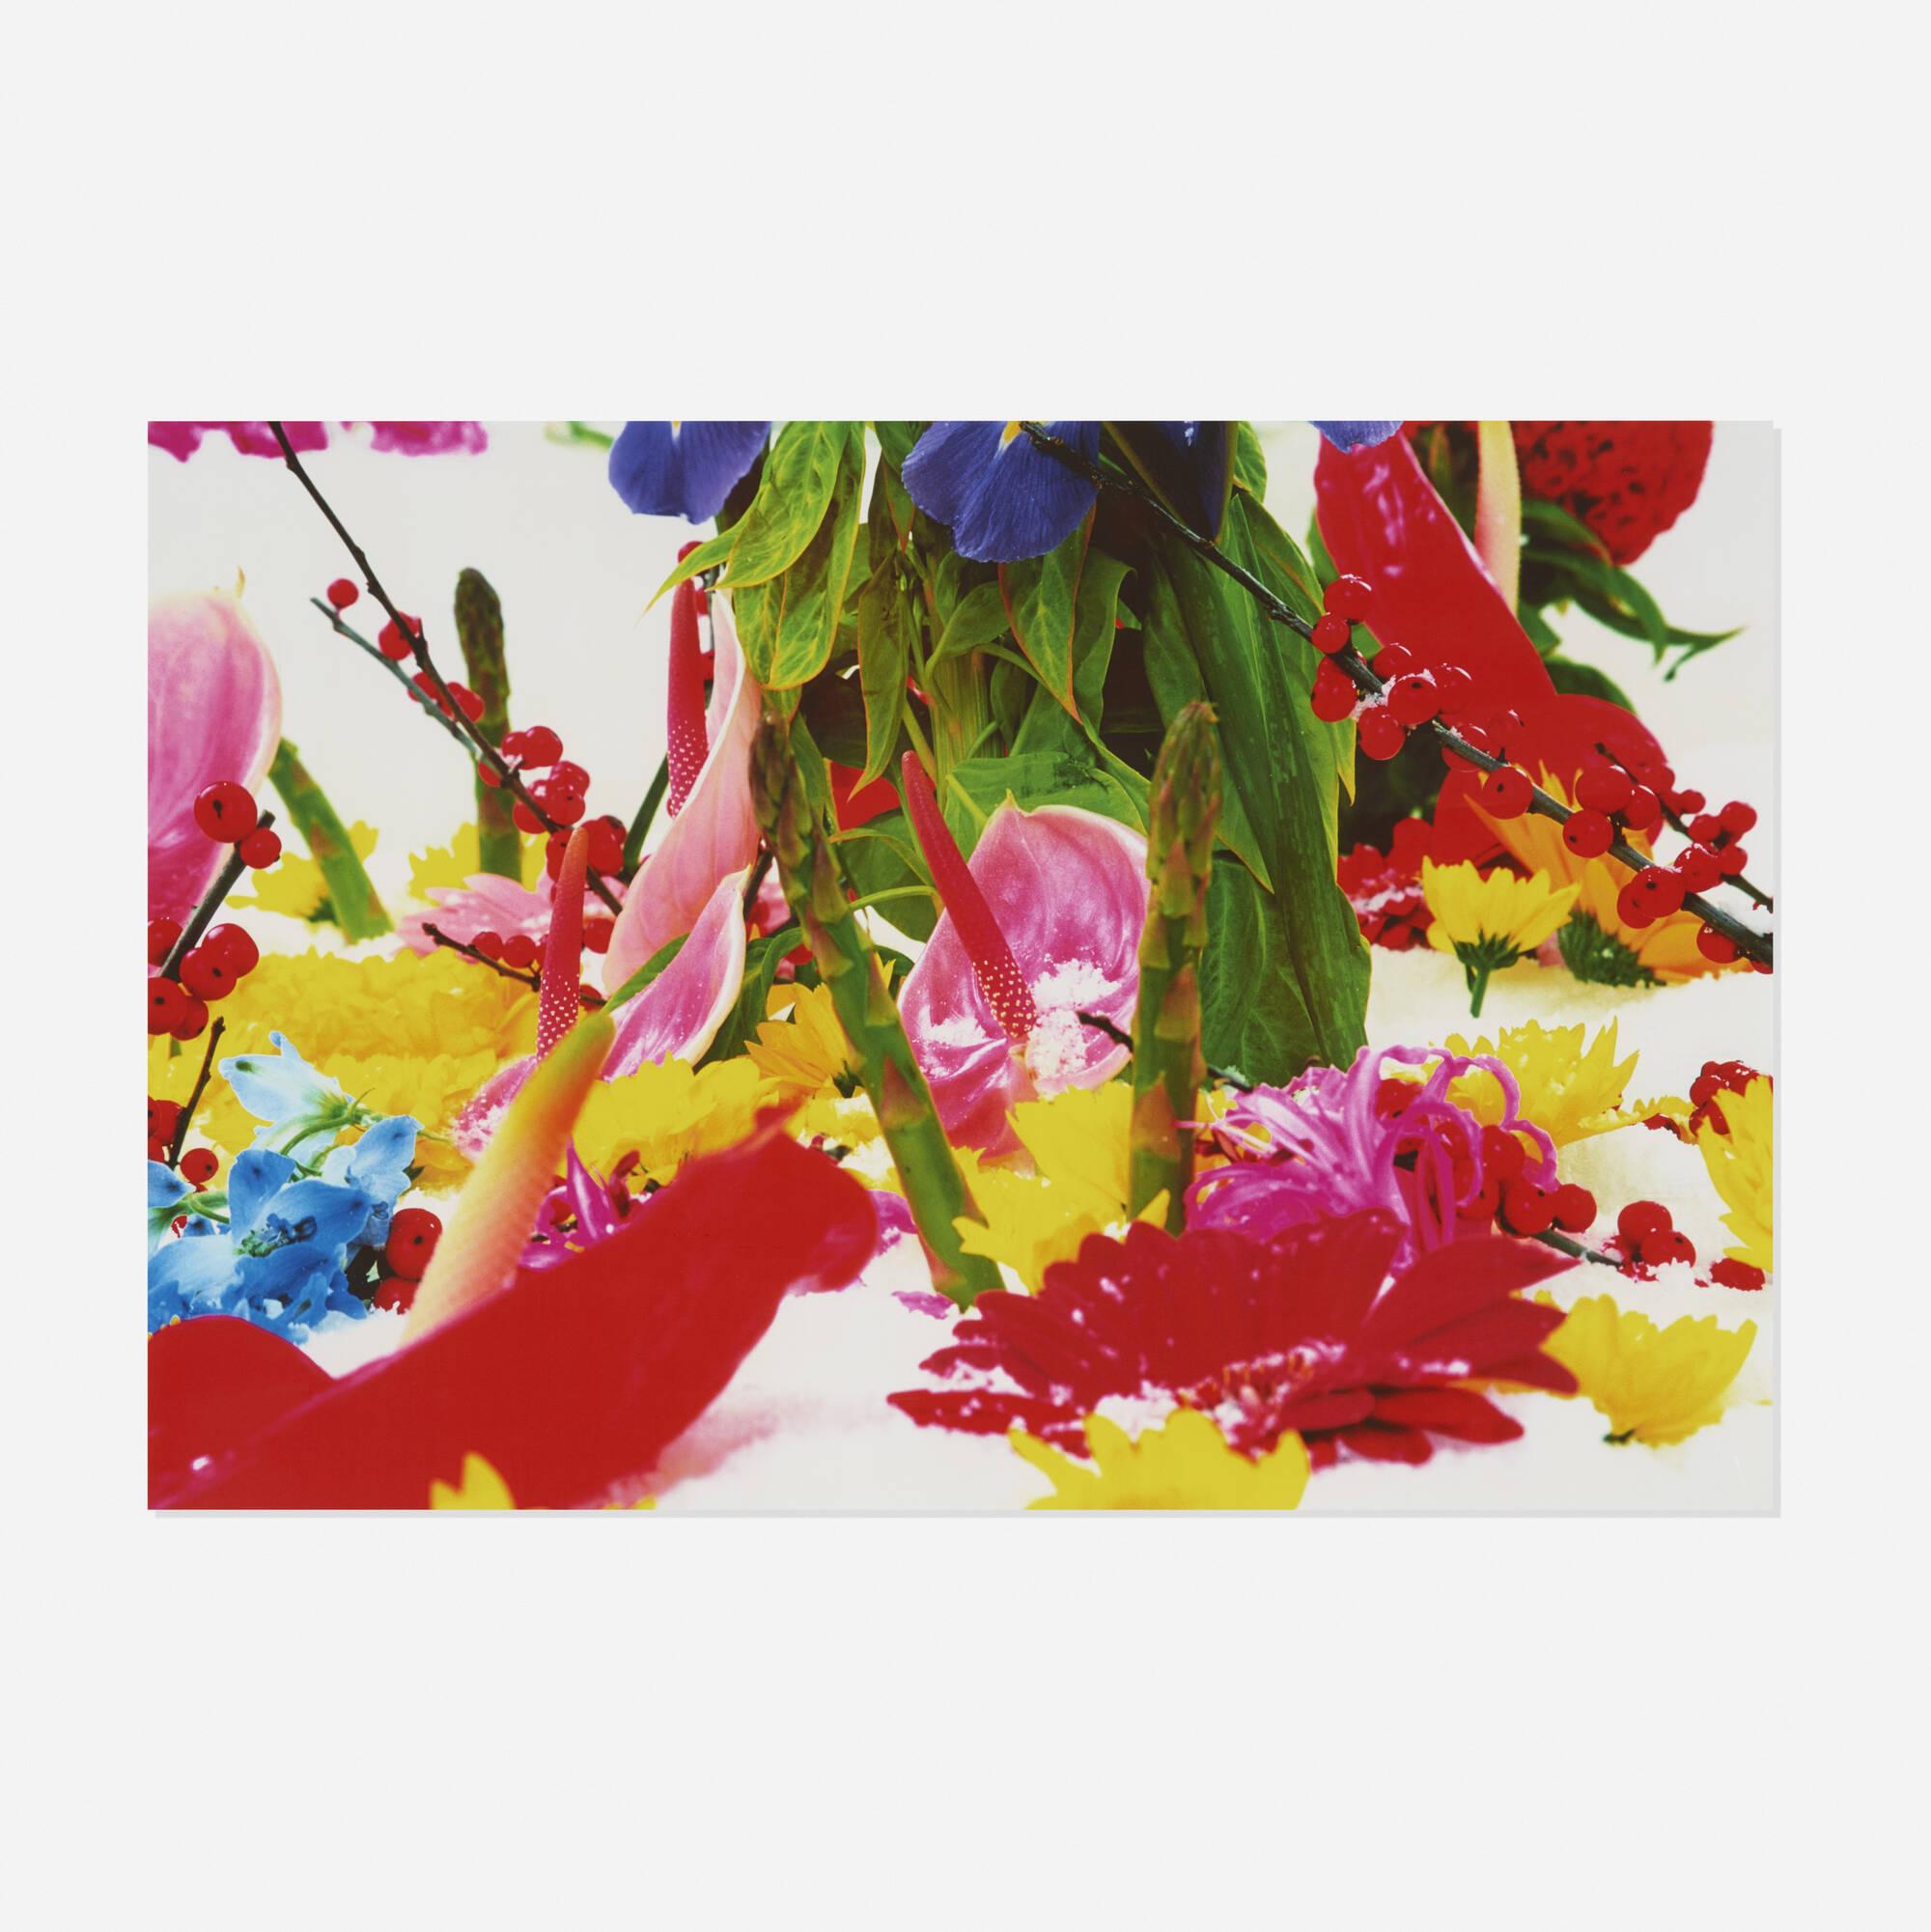 119: Marc Quinn / Winter Garden no. 5 (1 of 1)